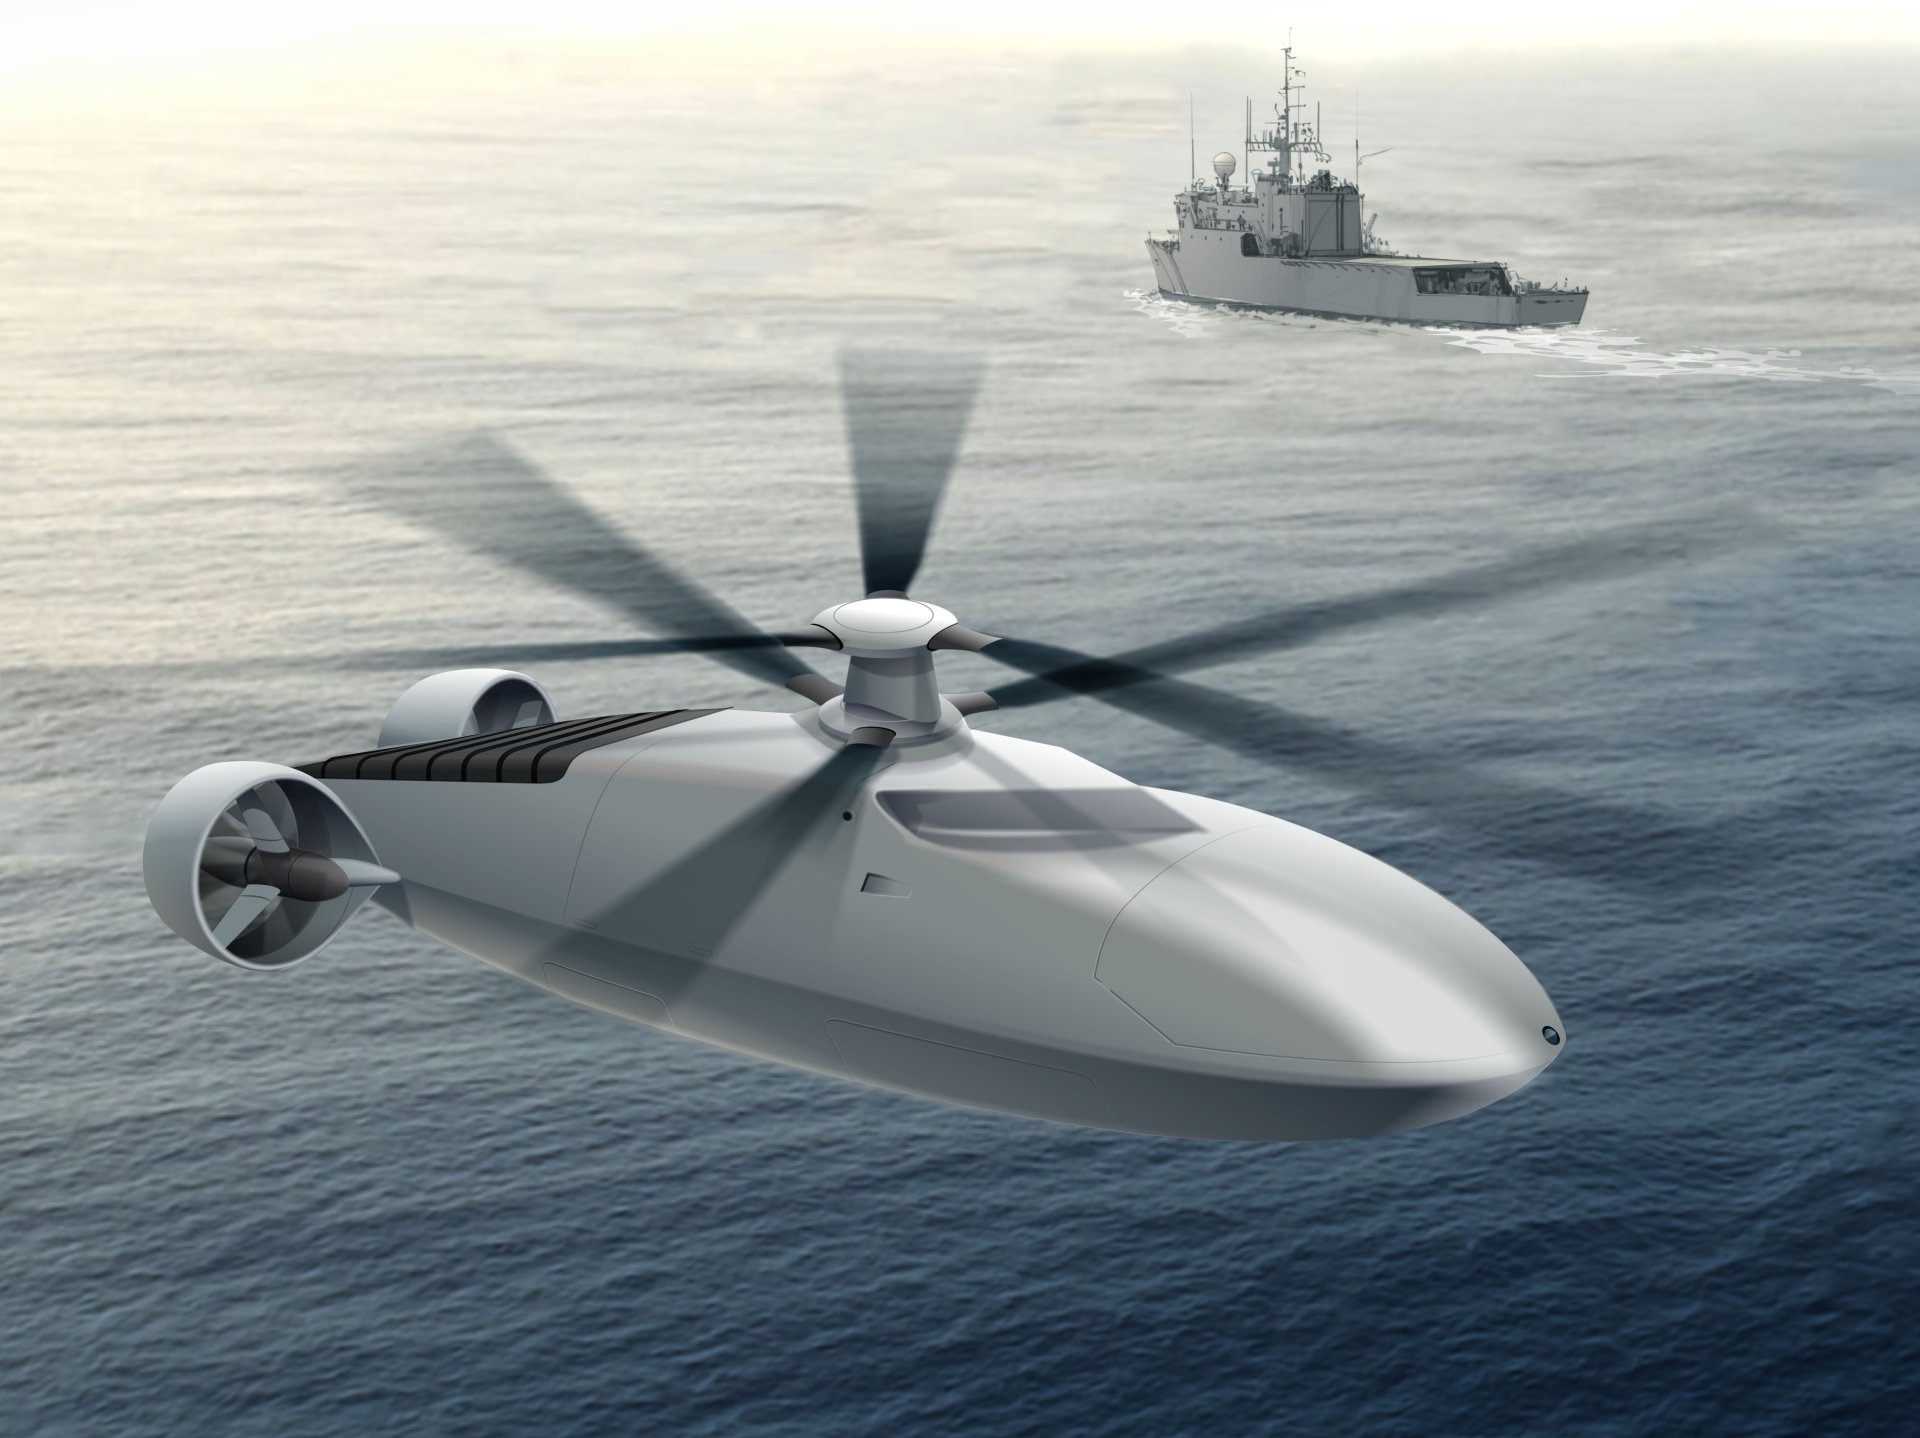 Helicoptero Hd Fondos De Escritorio: Helicóptero 5k Retina Ultra Fondo De Pantalla HD